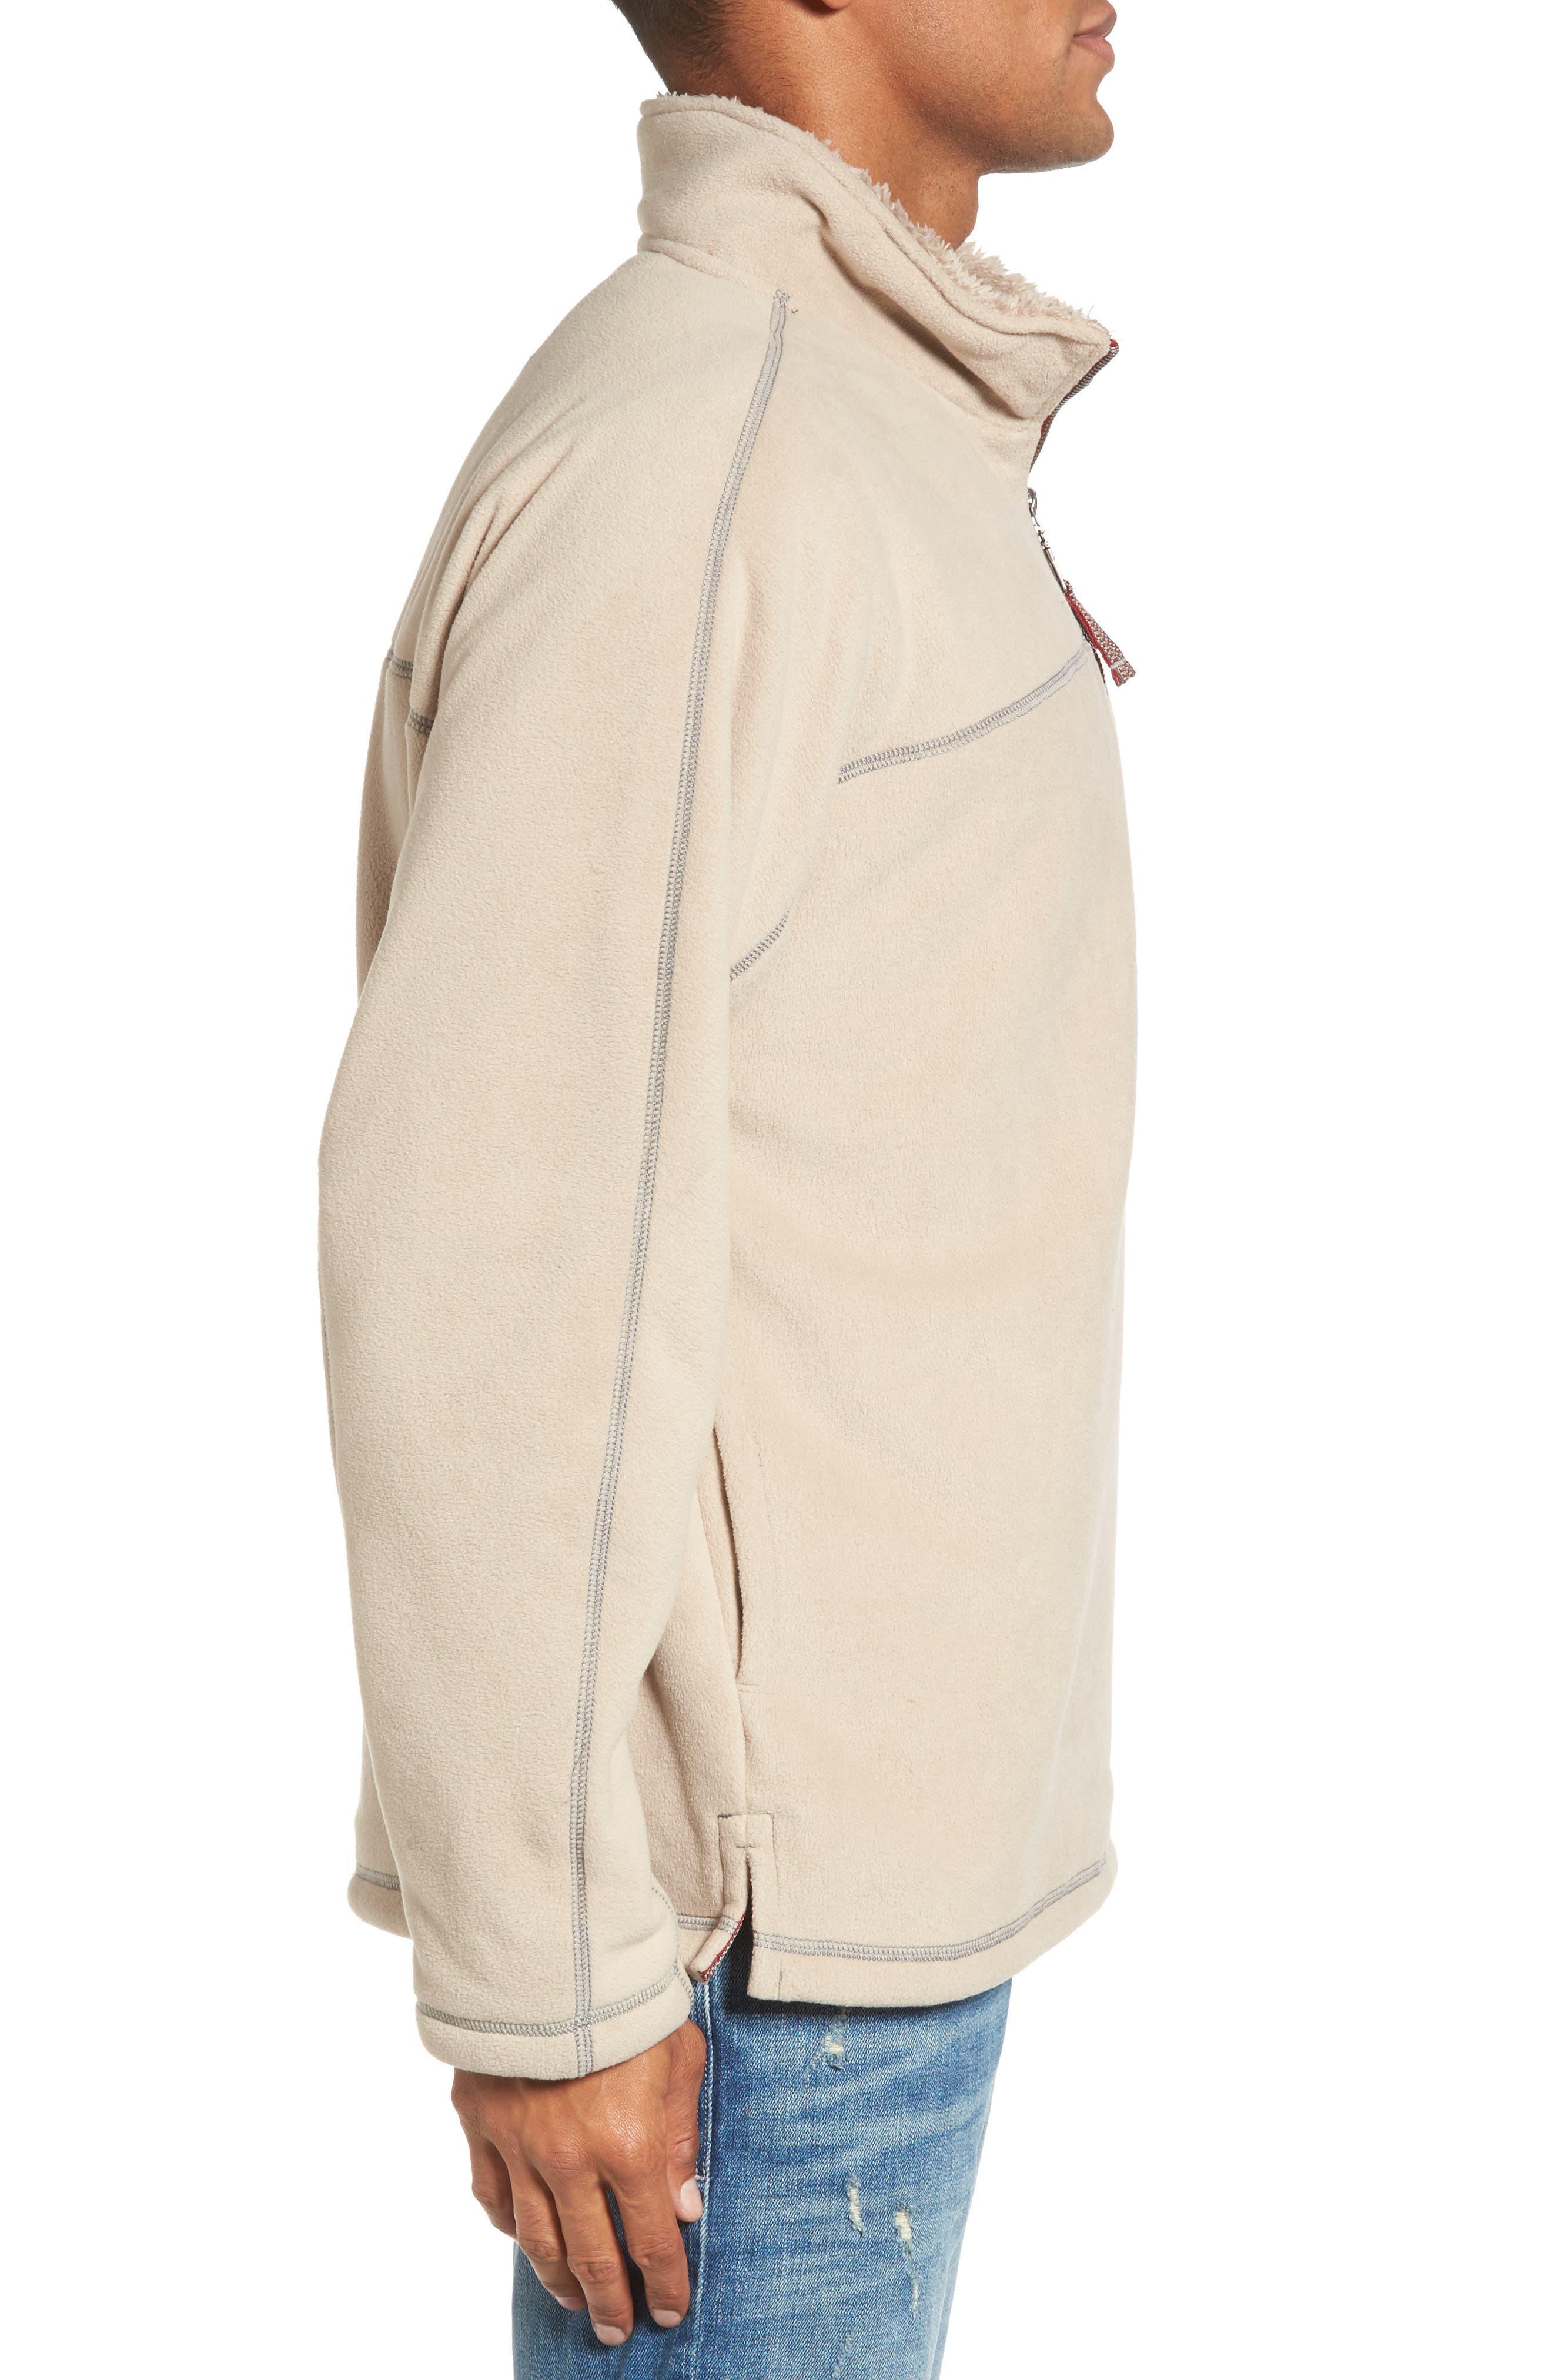 Bonded Polar Fleece Lined Pullover,                             Alternate thumbnail 3, color,                             Sand